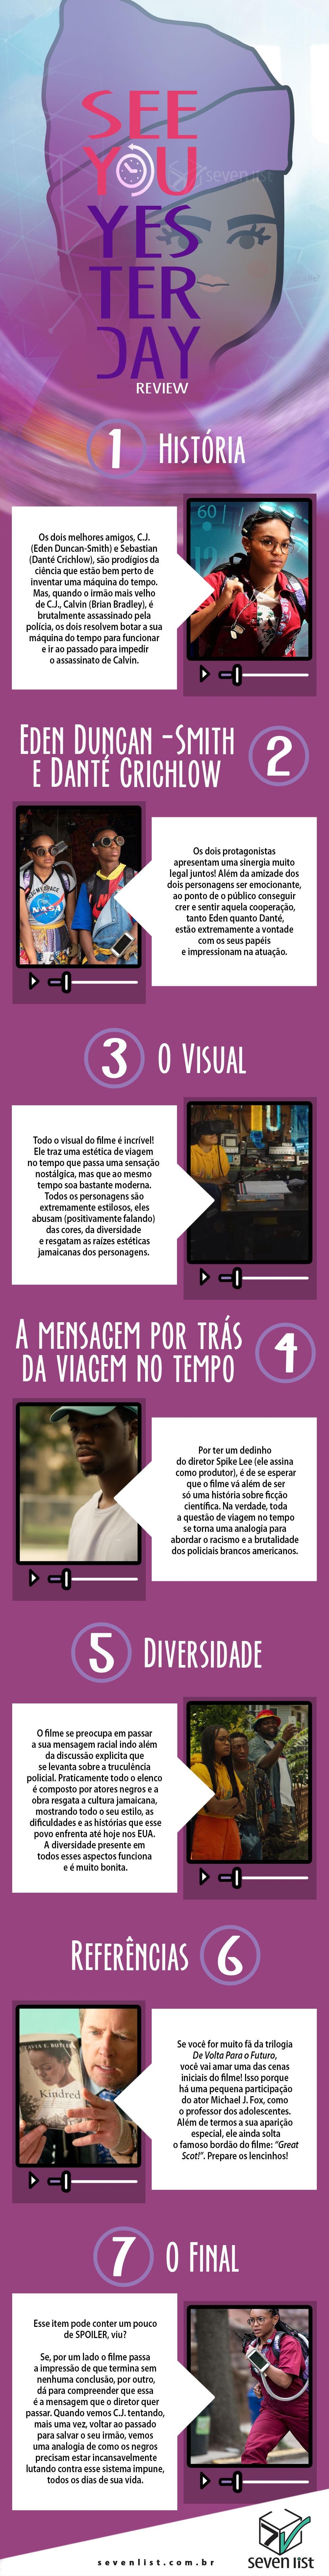 A GENTE SE VÊ ONTEM - CRÍTICA - NETFLIX - SEVEN LIST